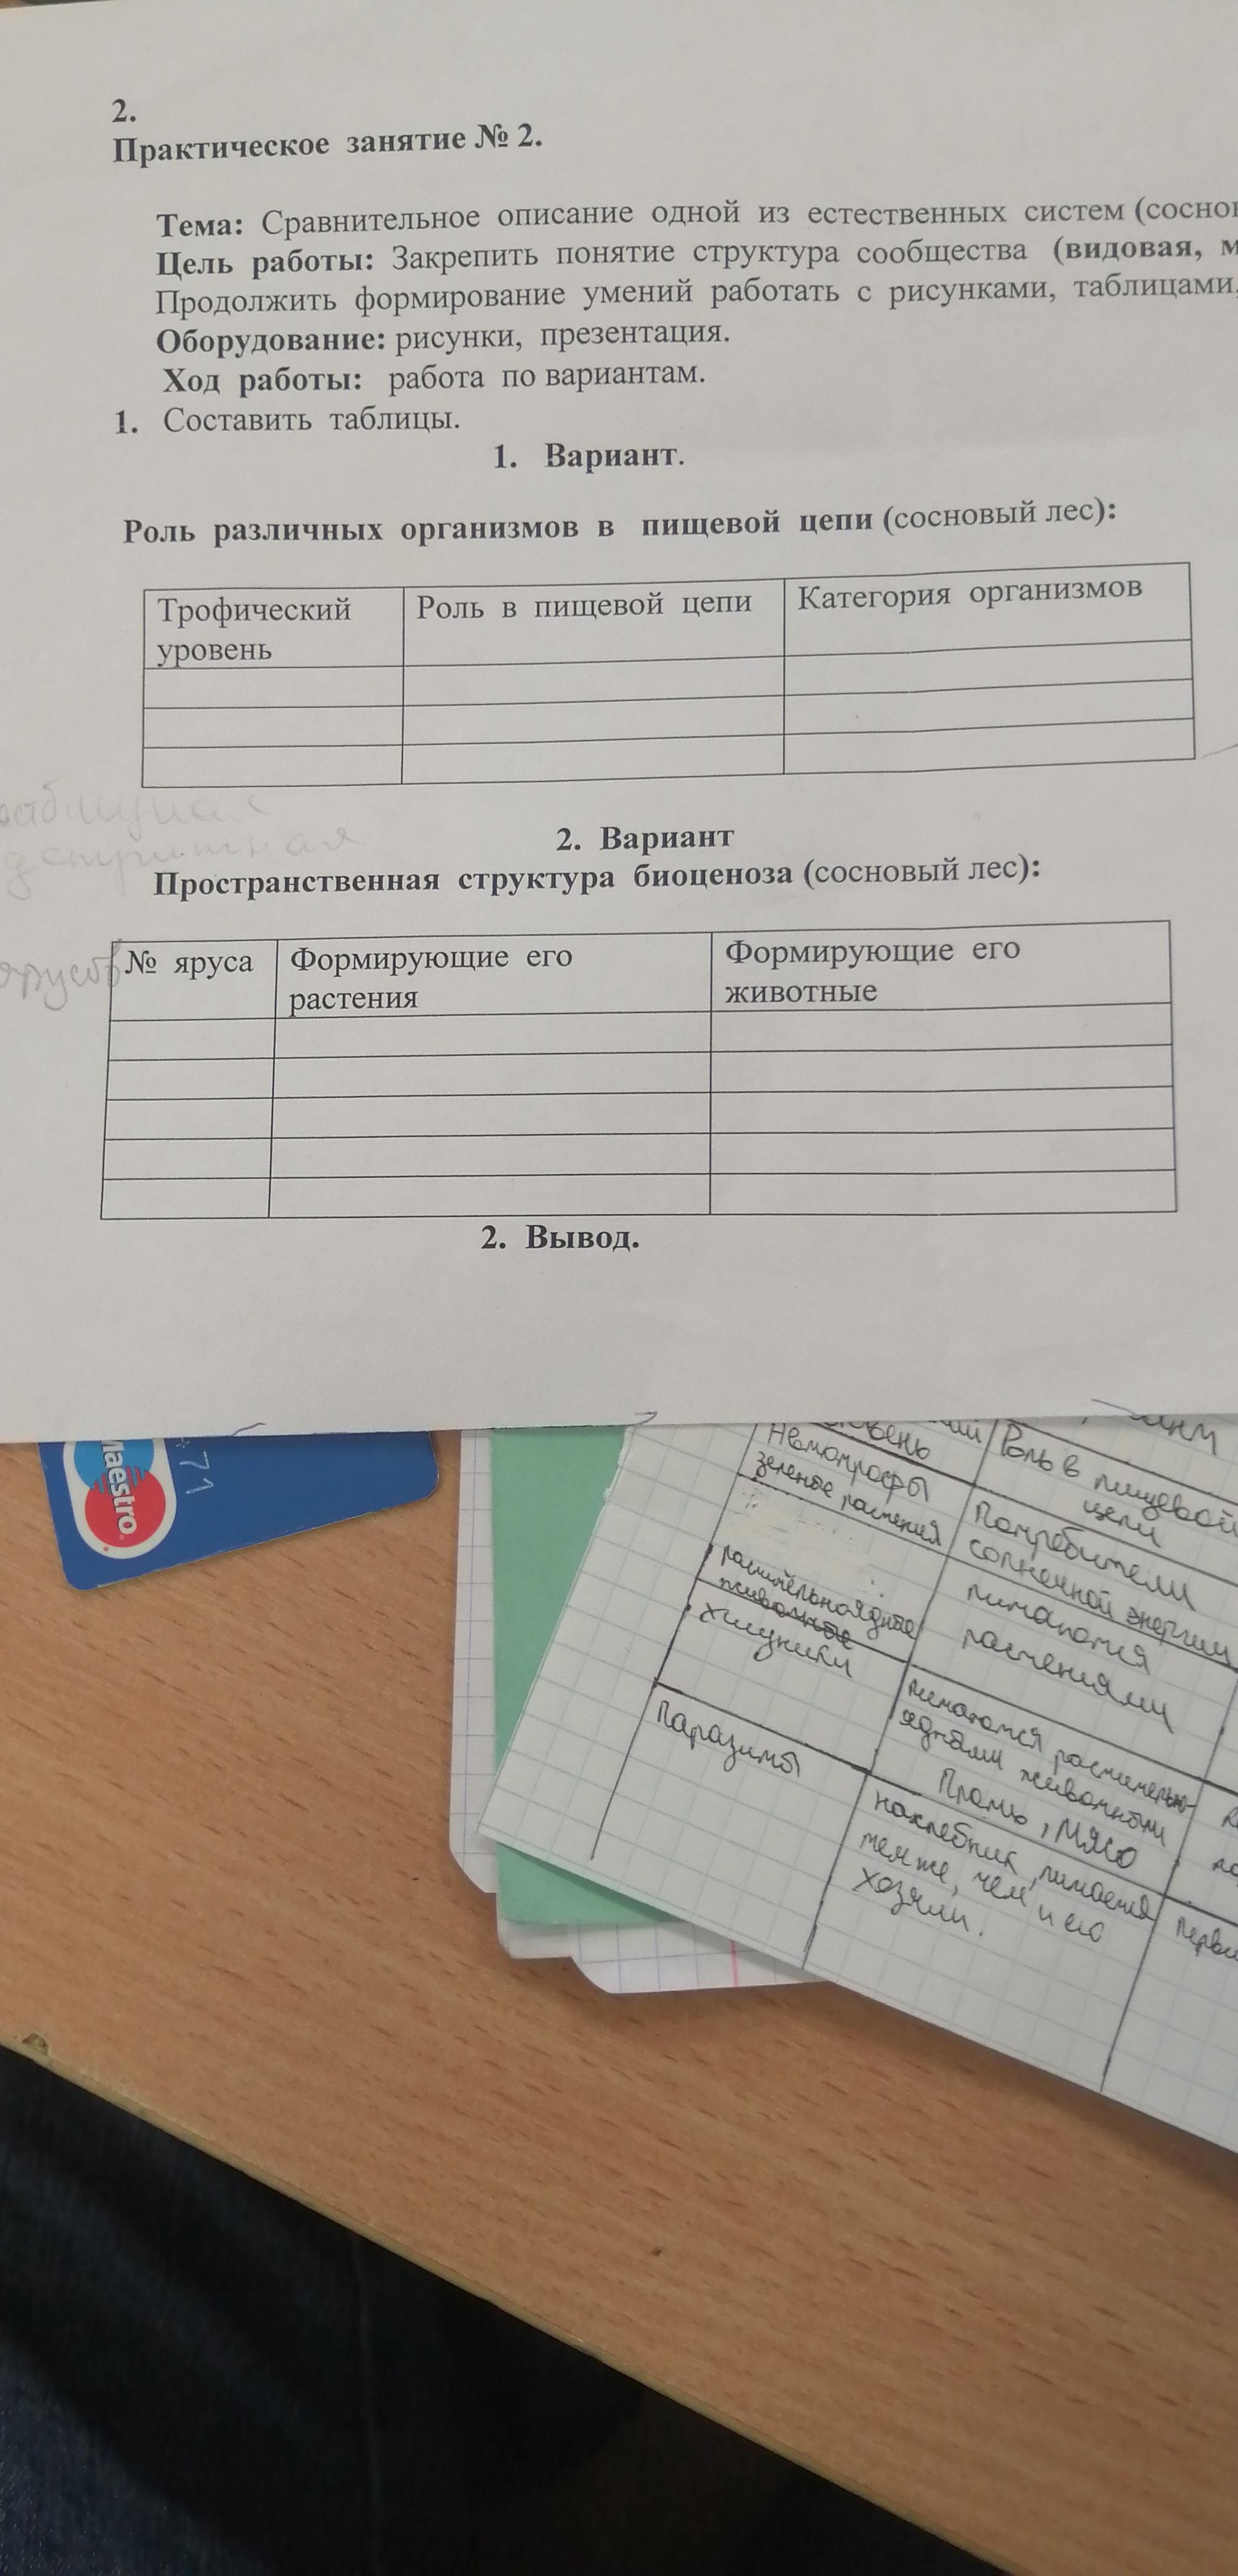 Помогите срочно 1 и 2 таблица